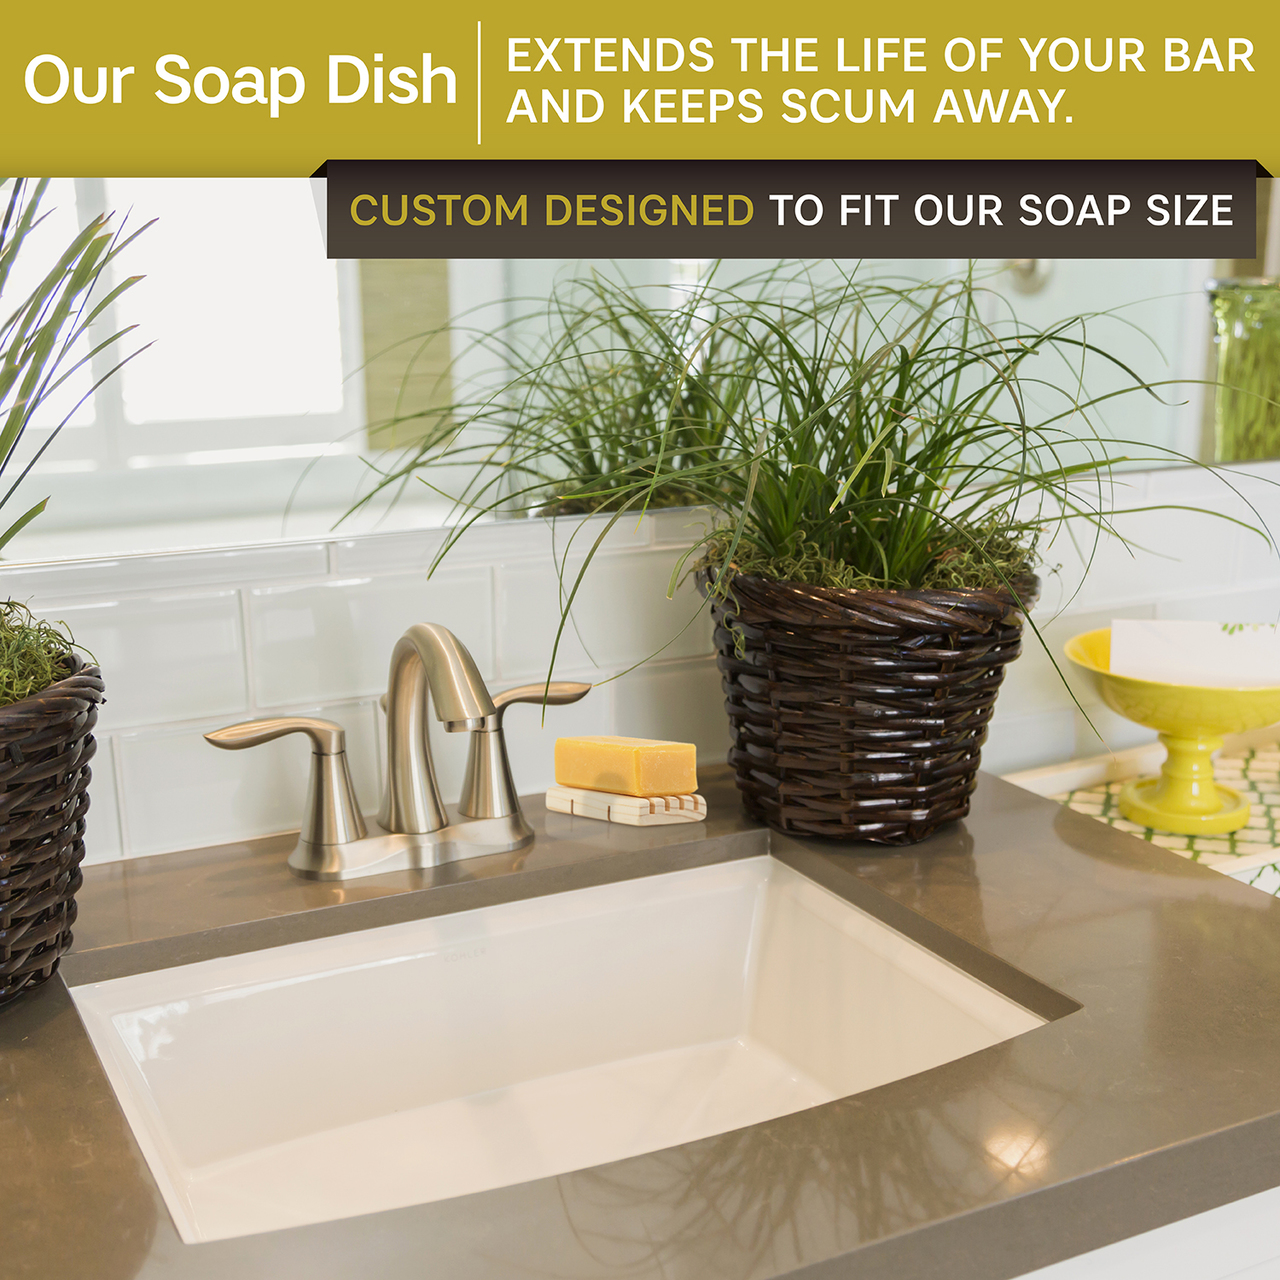 Natural Pine Wood Draining Soap Dish Saver Display Tray Holder Deck Stand, Amish USA Made